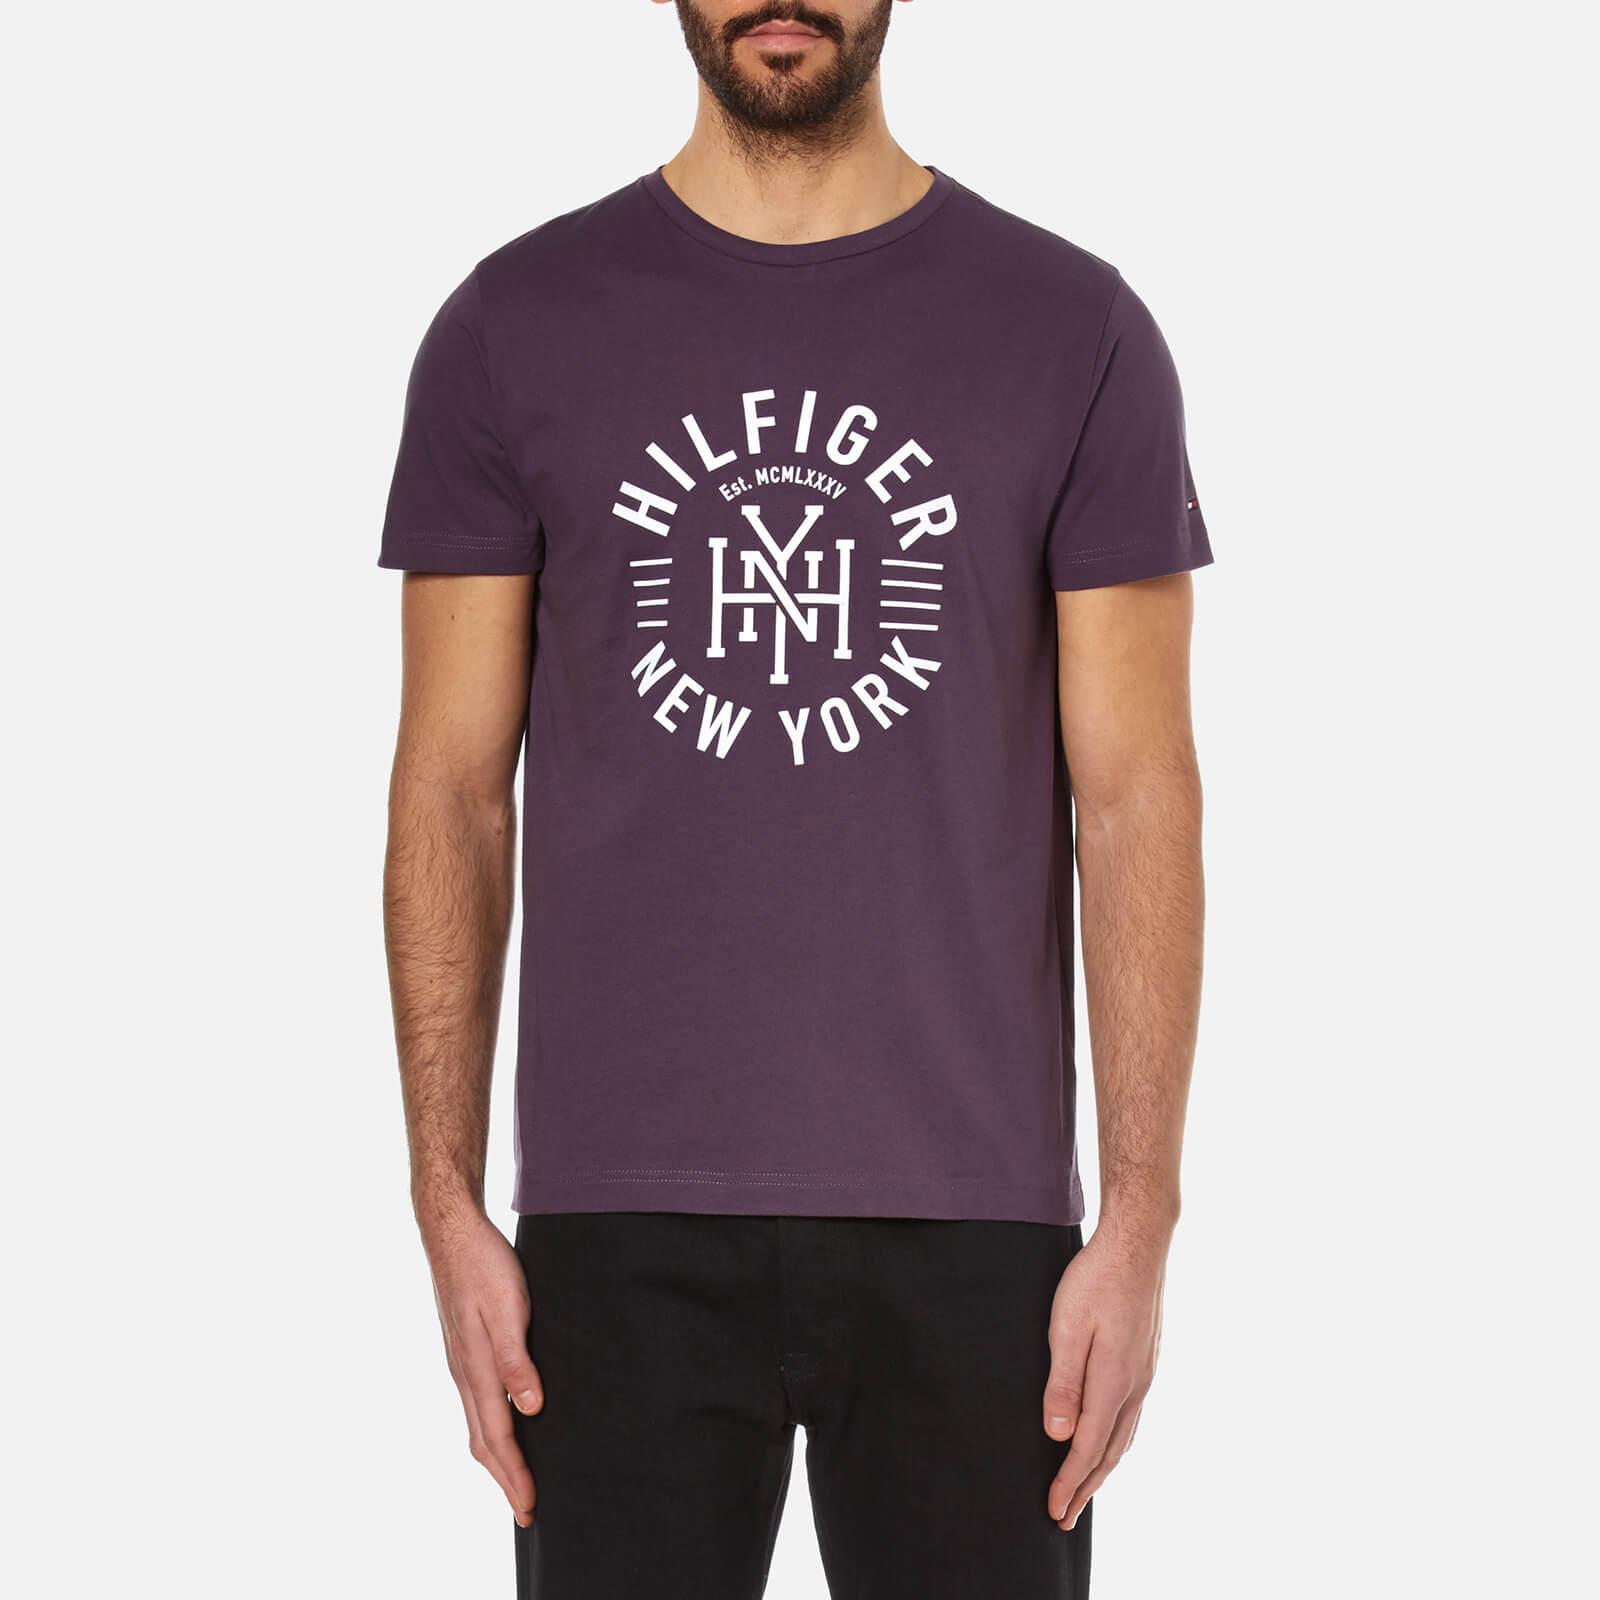 0d65c87cd751 Tommy Hilfiger Men's Maddock Printed Crew Neck T-Shirt - Sweet Grape  Clothing | TheHut.com